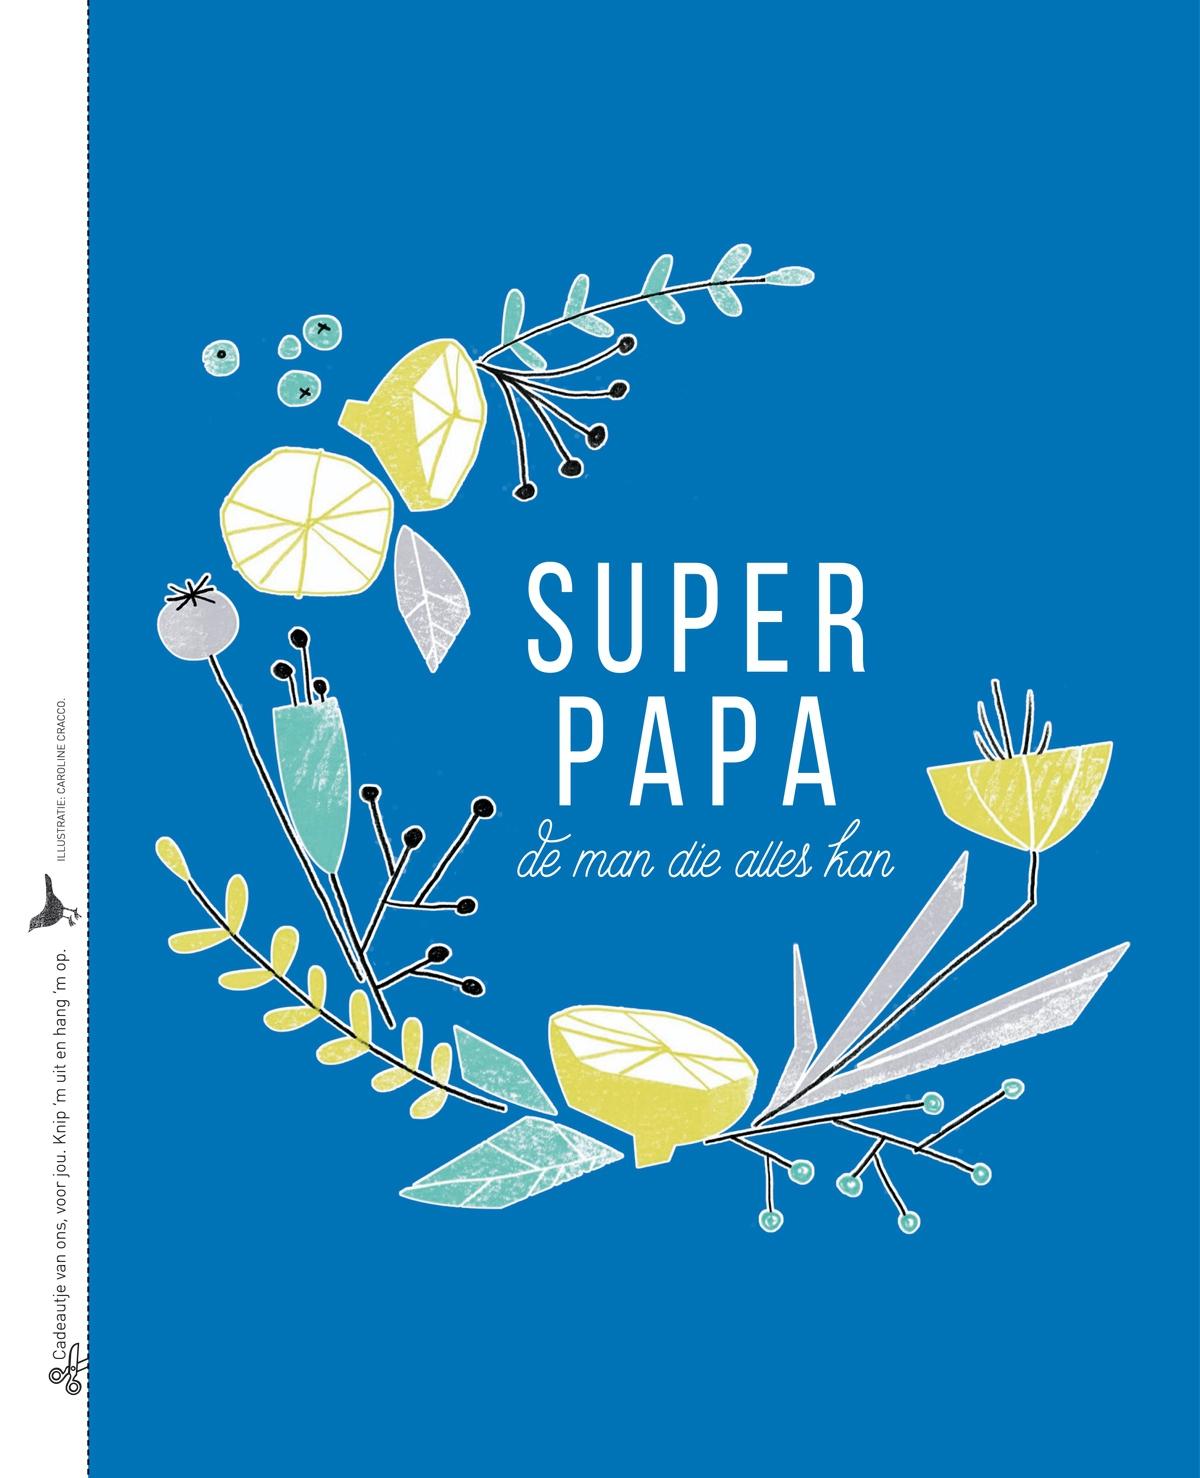 Spreuk: Super papa